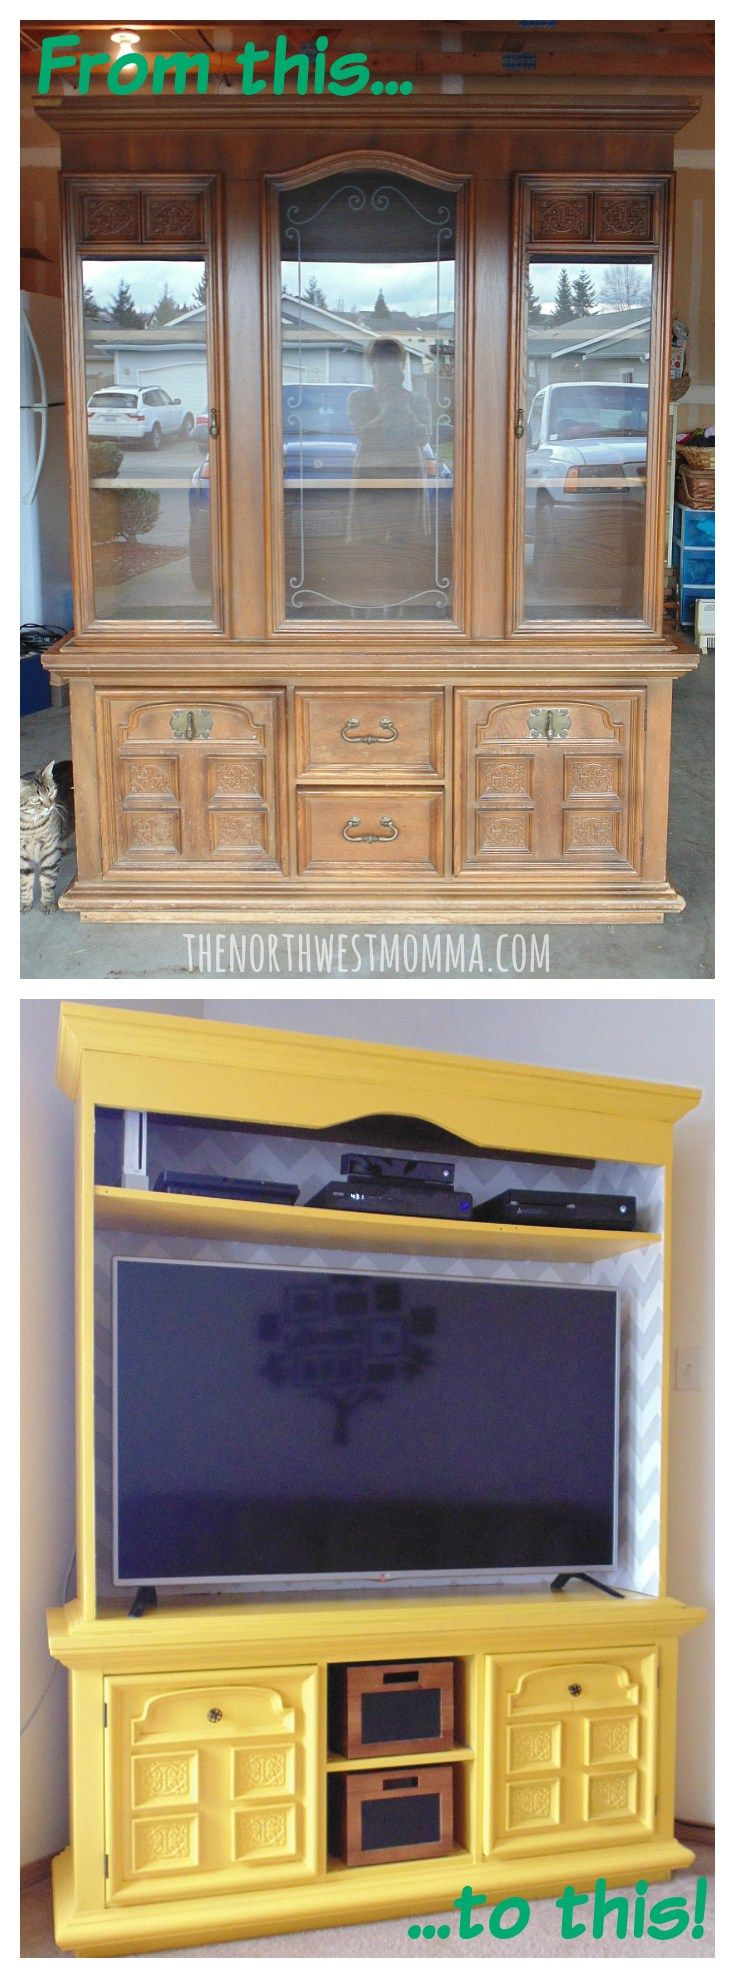 DIY Repurposed China Hutch into a TV Stand!